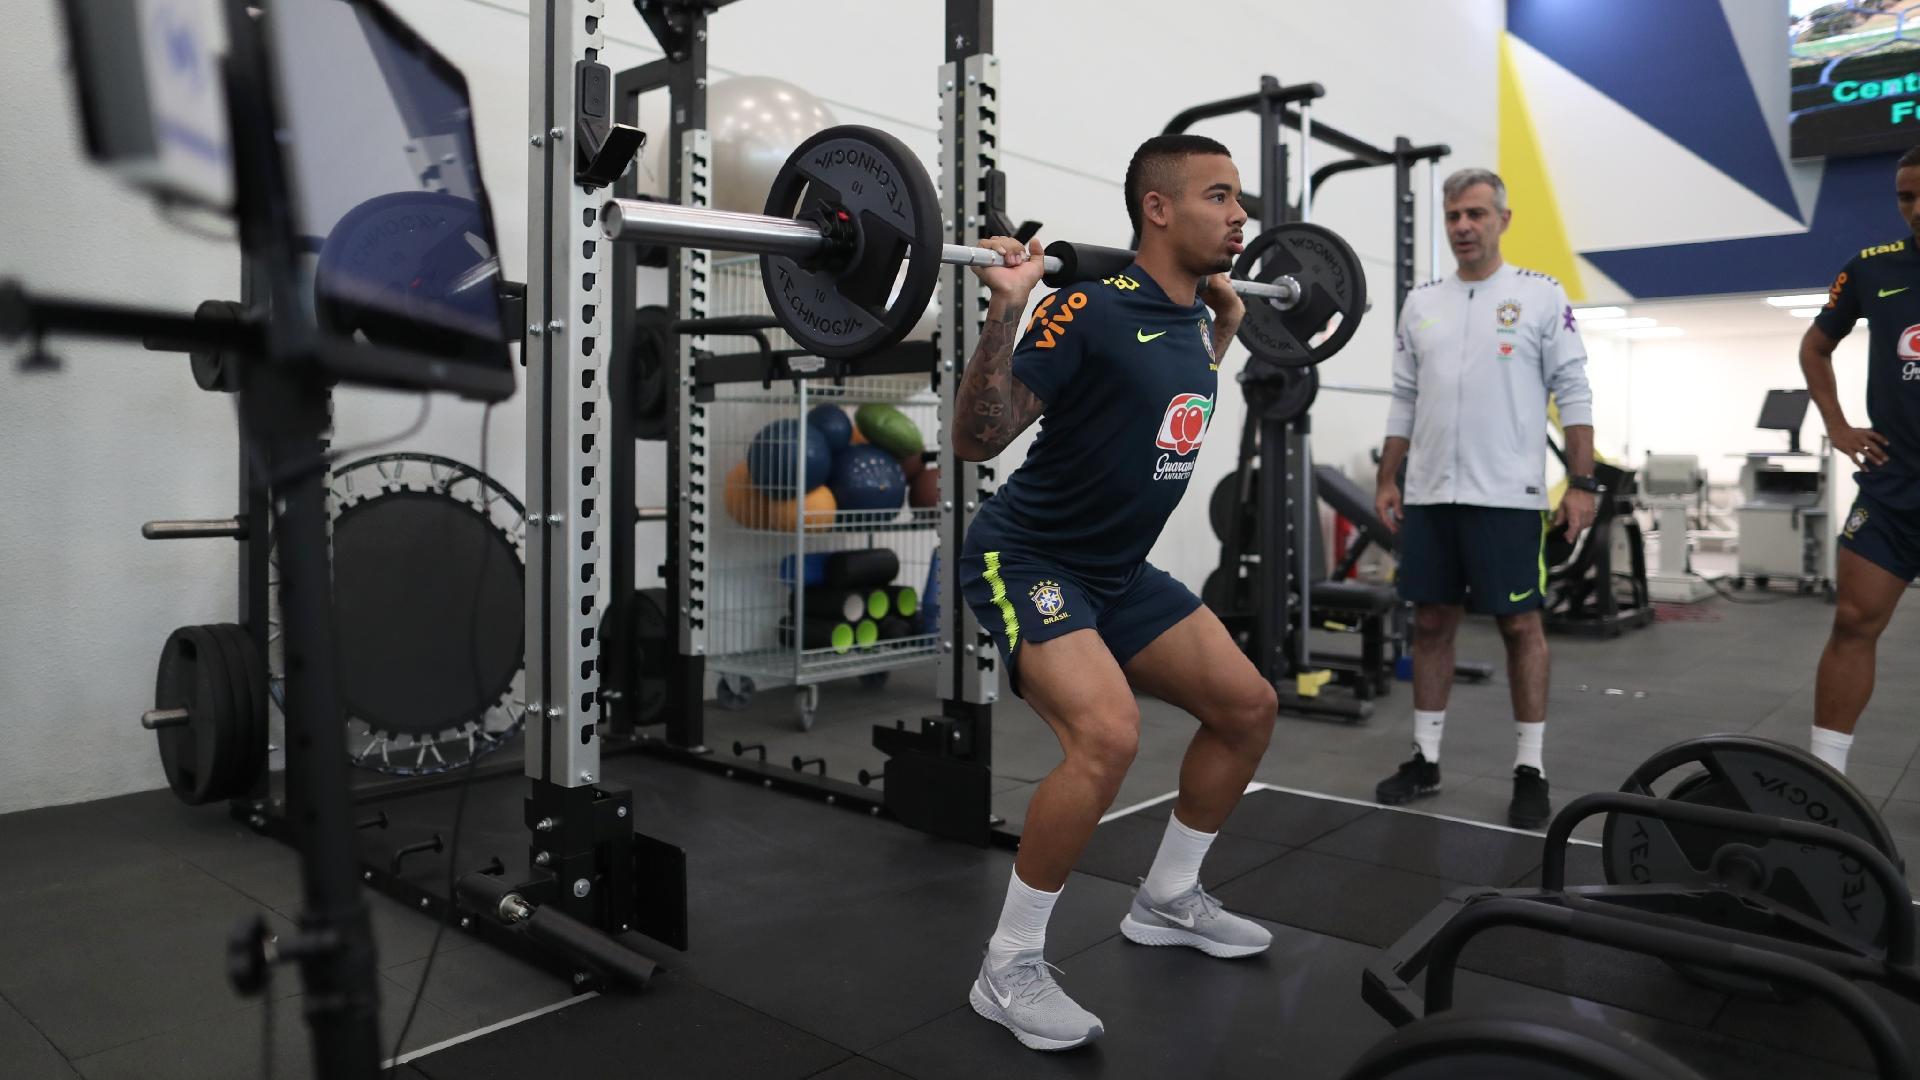 Gabriel Jesus participa de treino físico na academia da Granja Comary